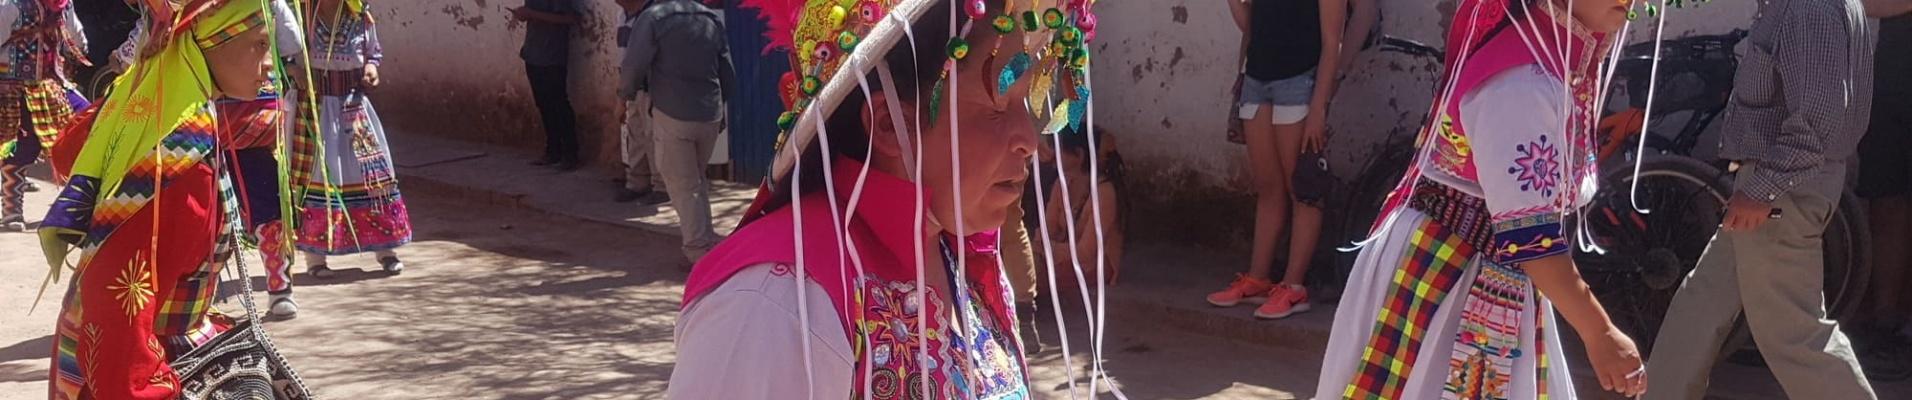 Danse tenues traditionnelles San Pedro de Atacama, Chili. Expertise locale.